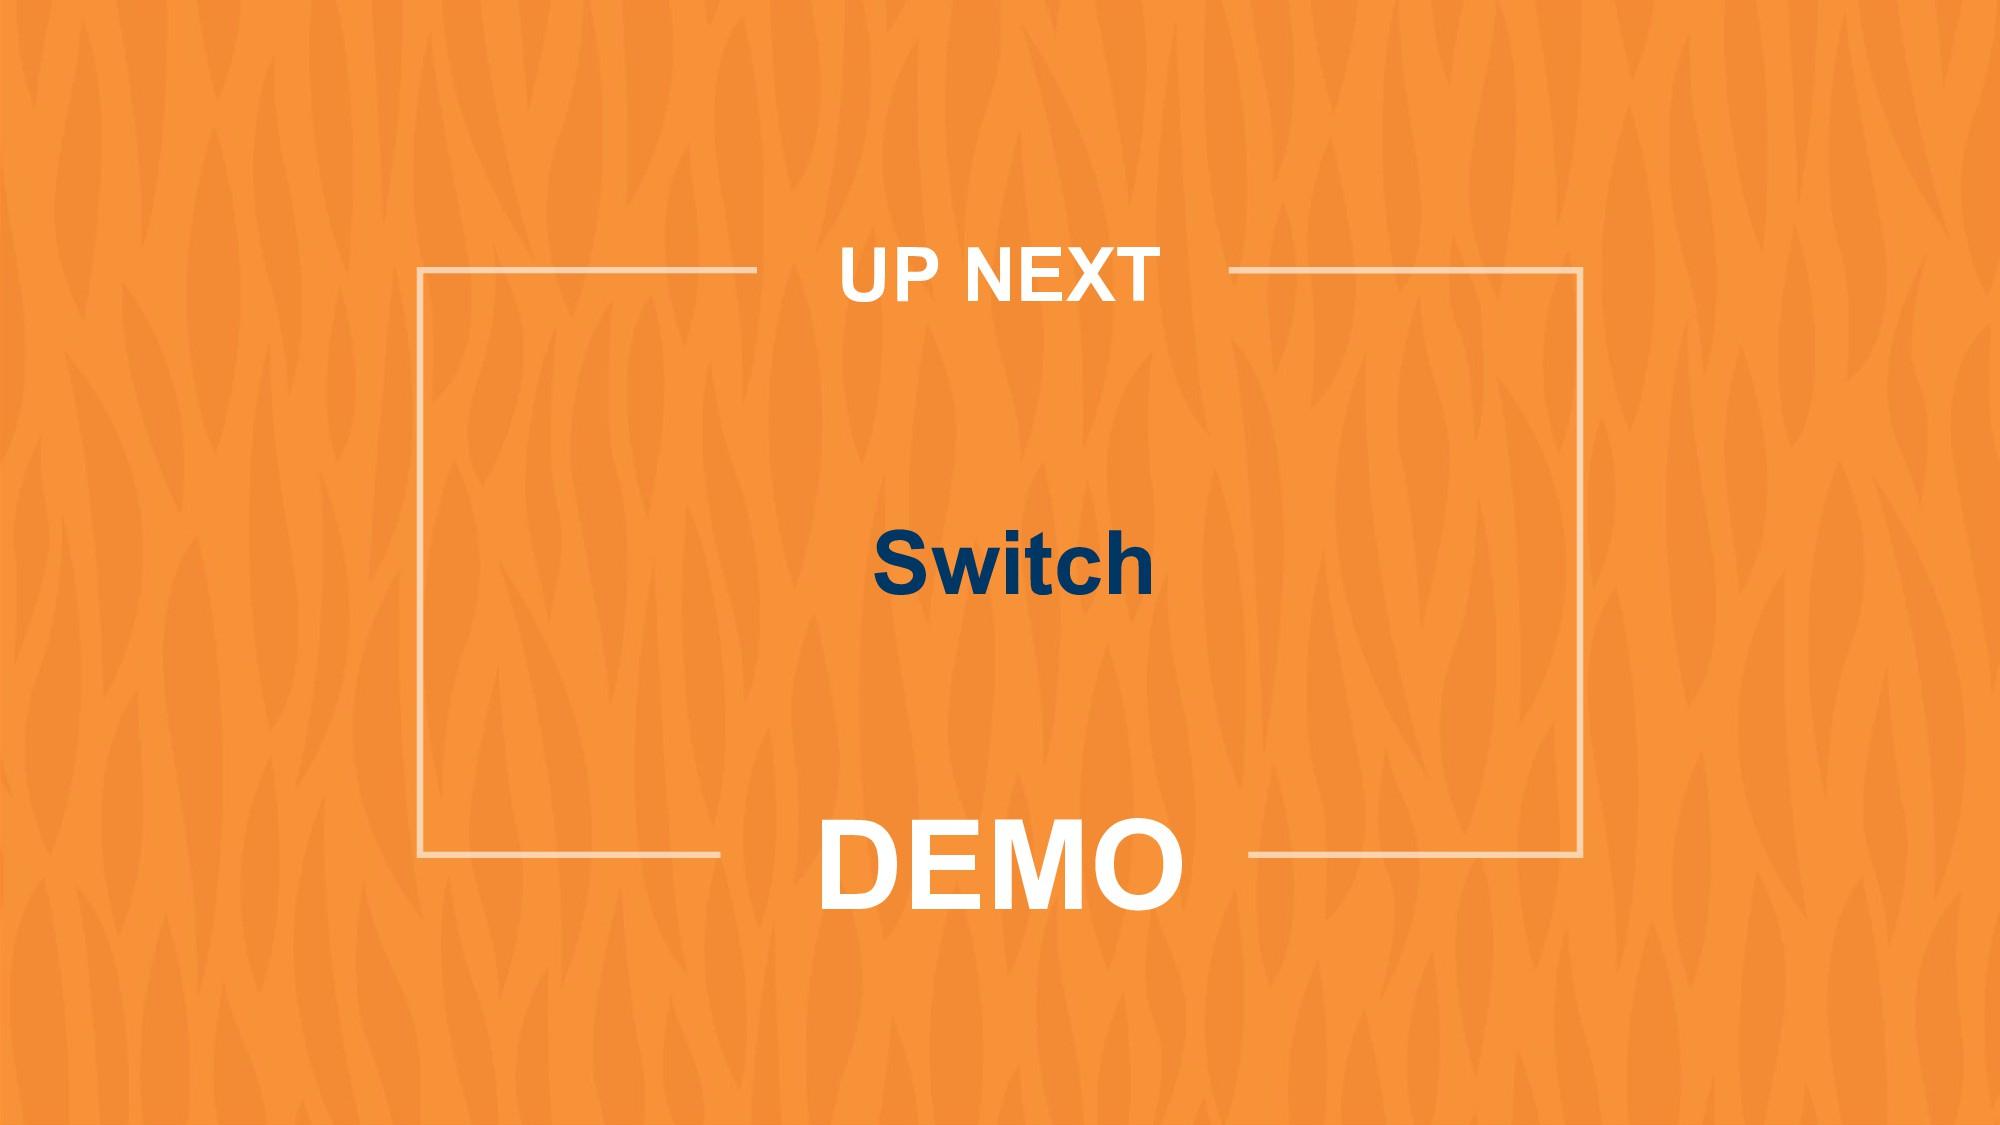 DEMO UP NEXT Switch